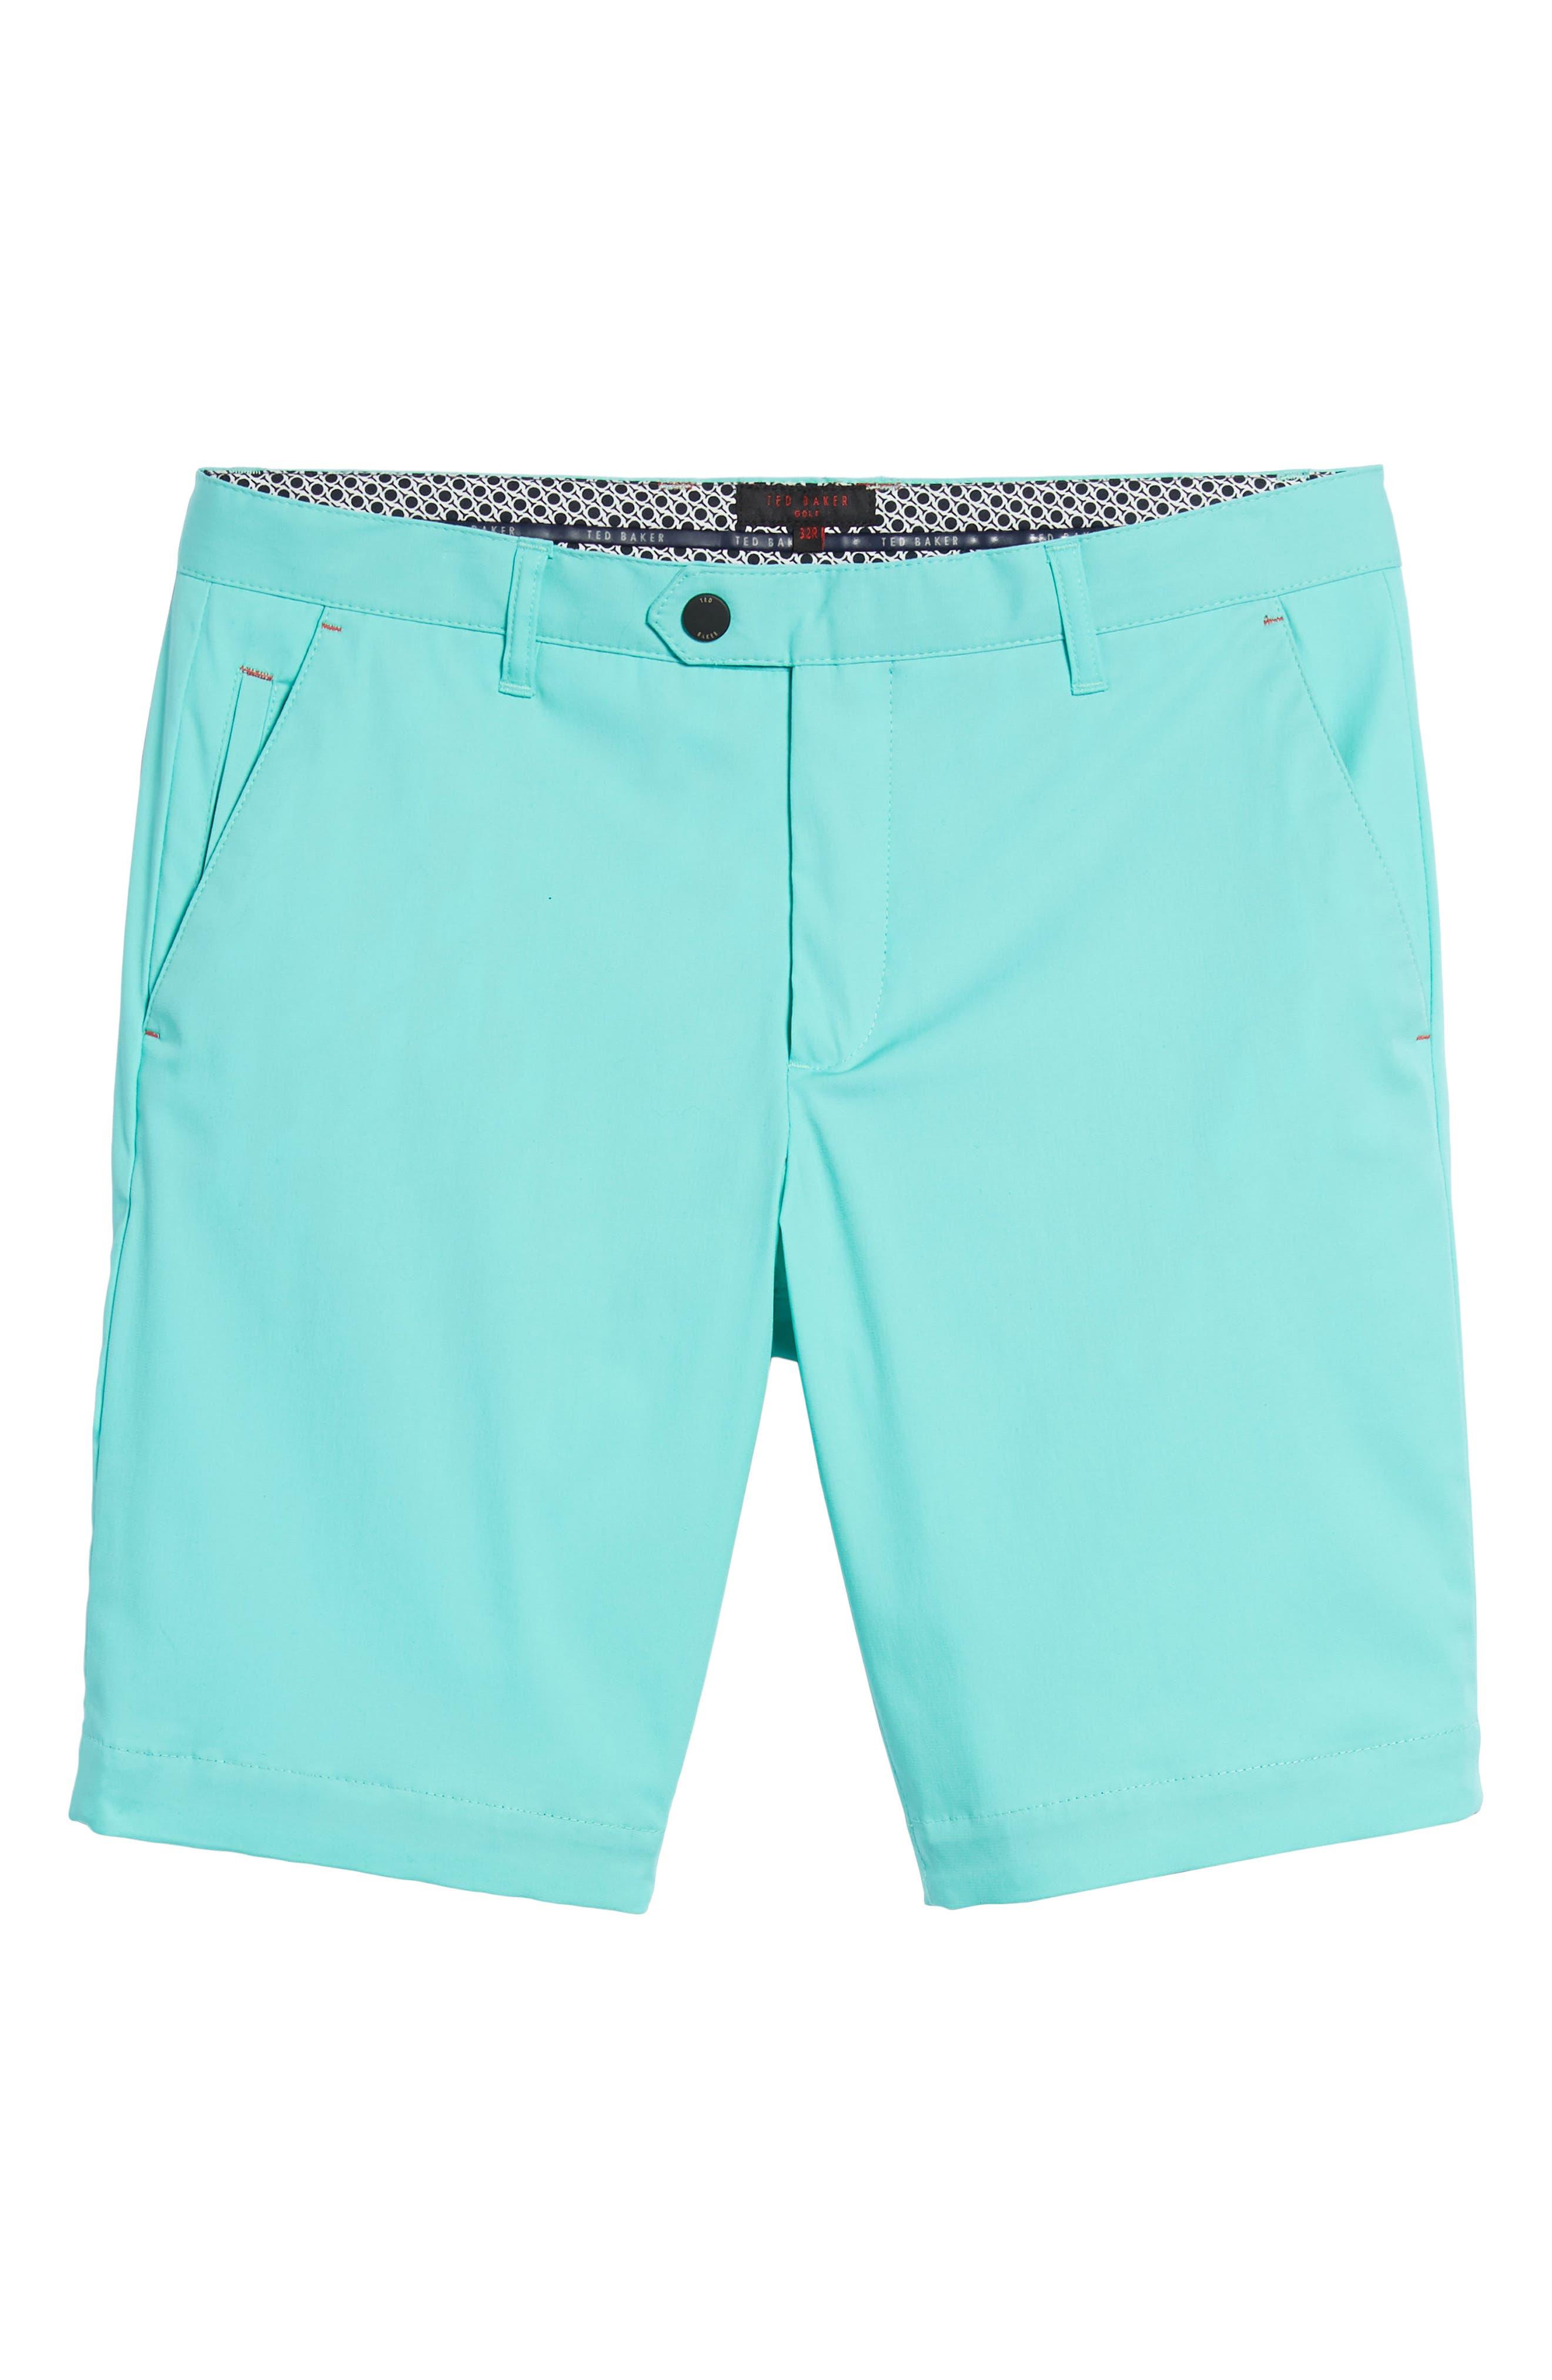 Twopar Flat Front Shorts,                             Alternate thumbnail 6, color,                             GREEN